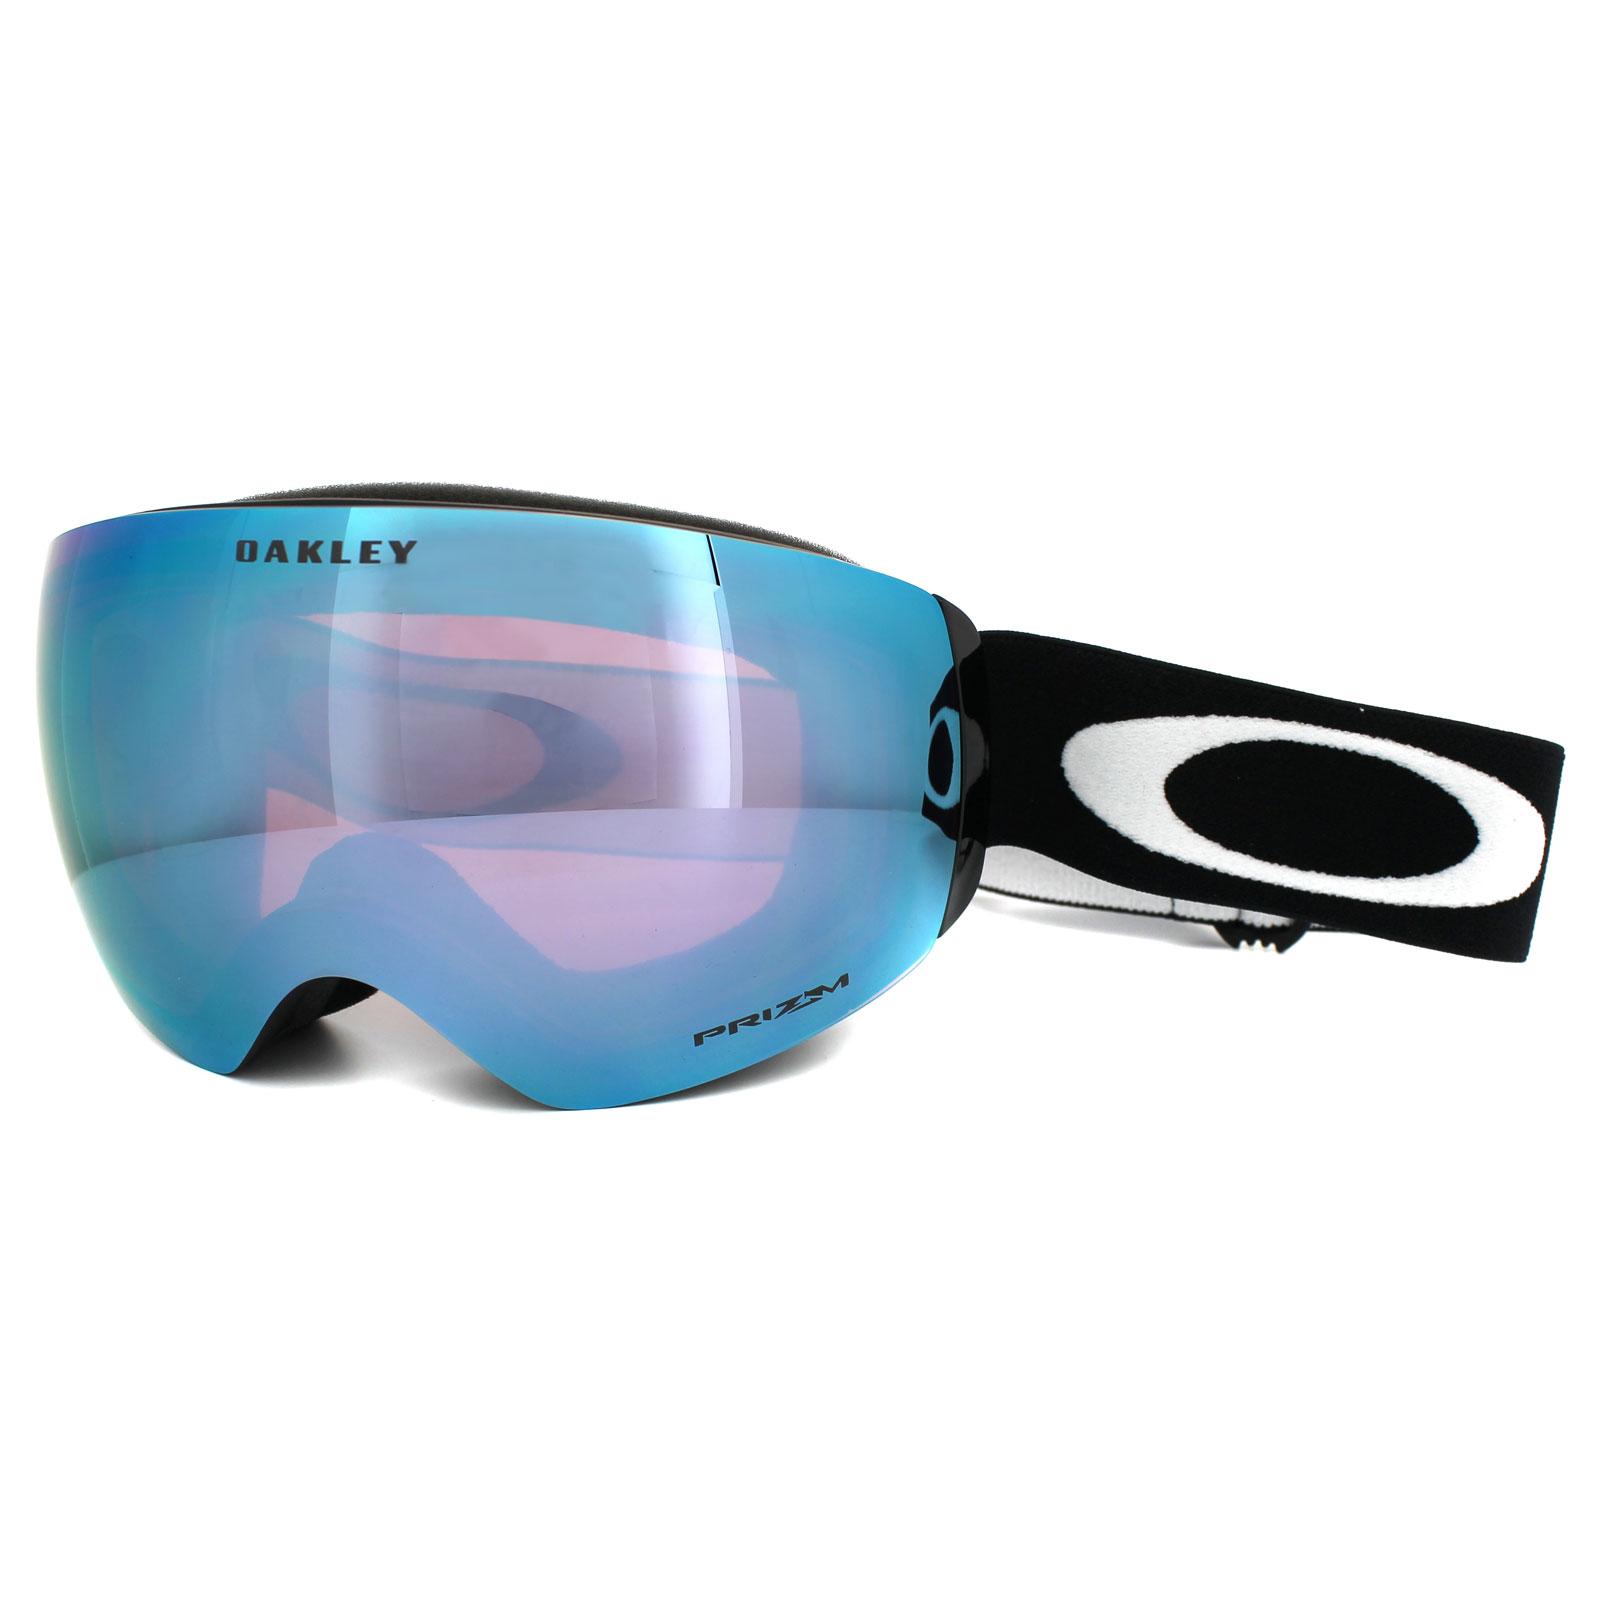 456c4dc565 Sentinel Oakley Ski Snow Goggles Flight Deck XM OO7064-41 Black Prizm  Sapphire Iridium